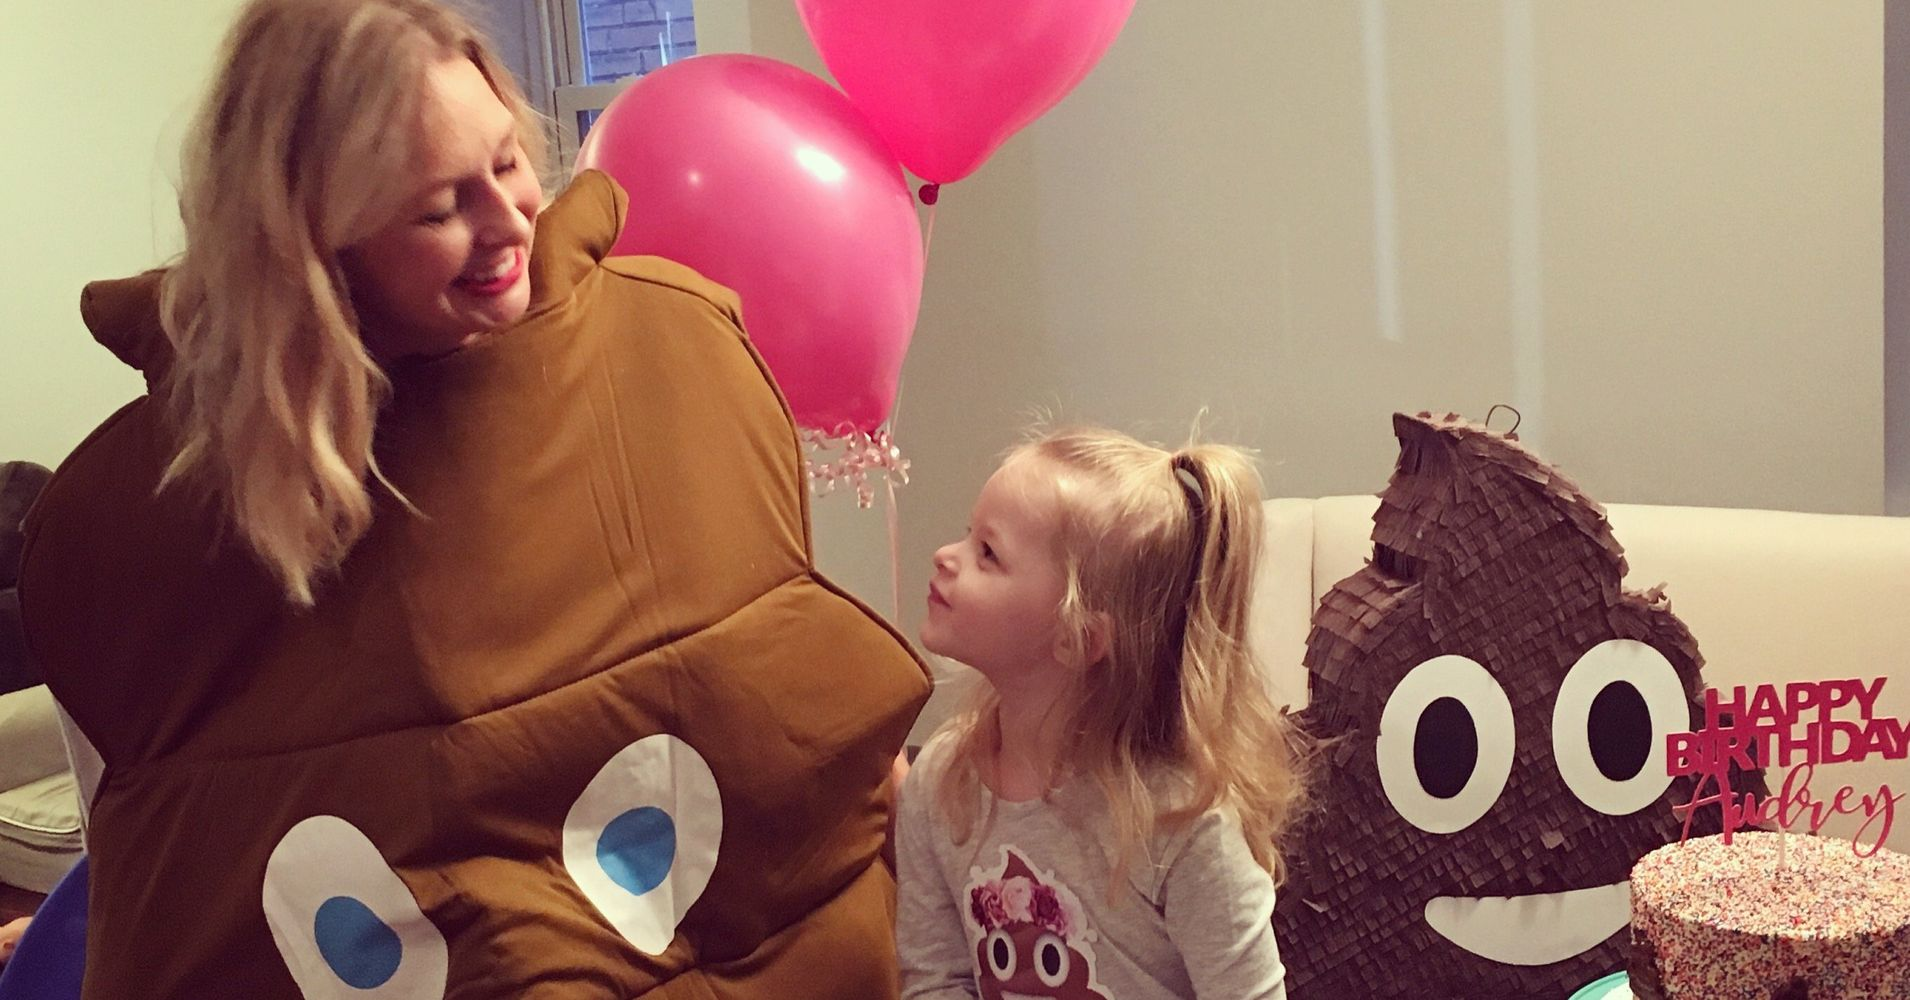 27 Adorably Strange Birthday Party Themes Kids Have Chosen Huffpost Life